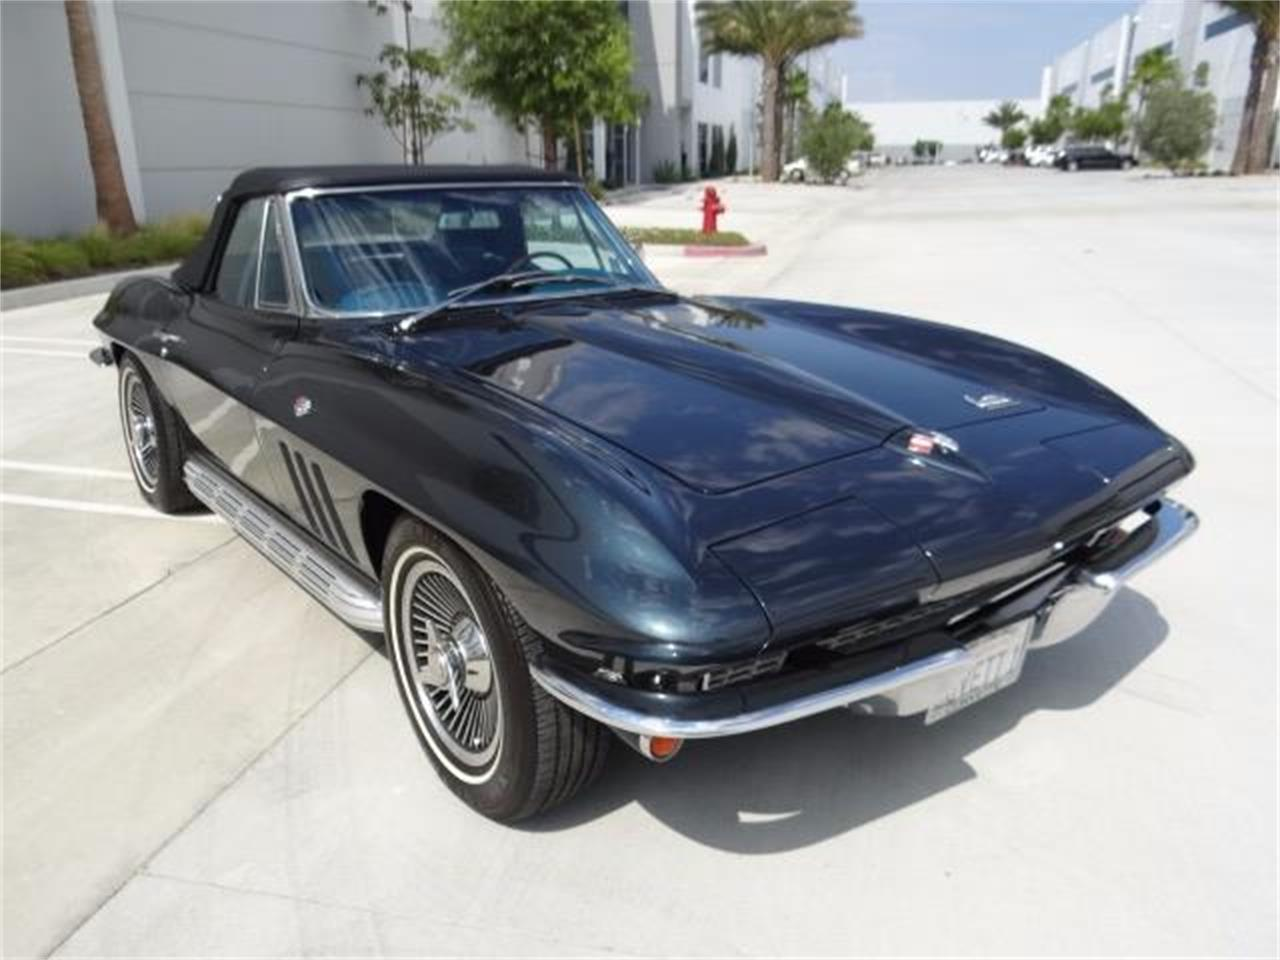 Large Picture of 1966 Corvette located in California - $65,000.00 - LEPG